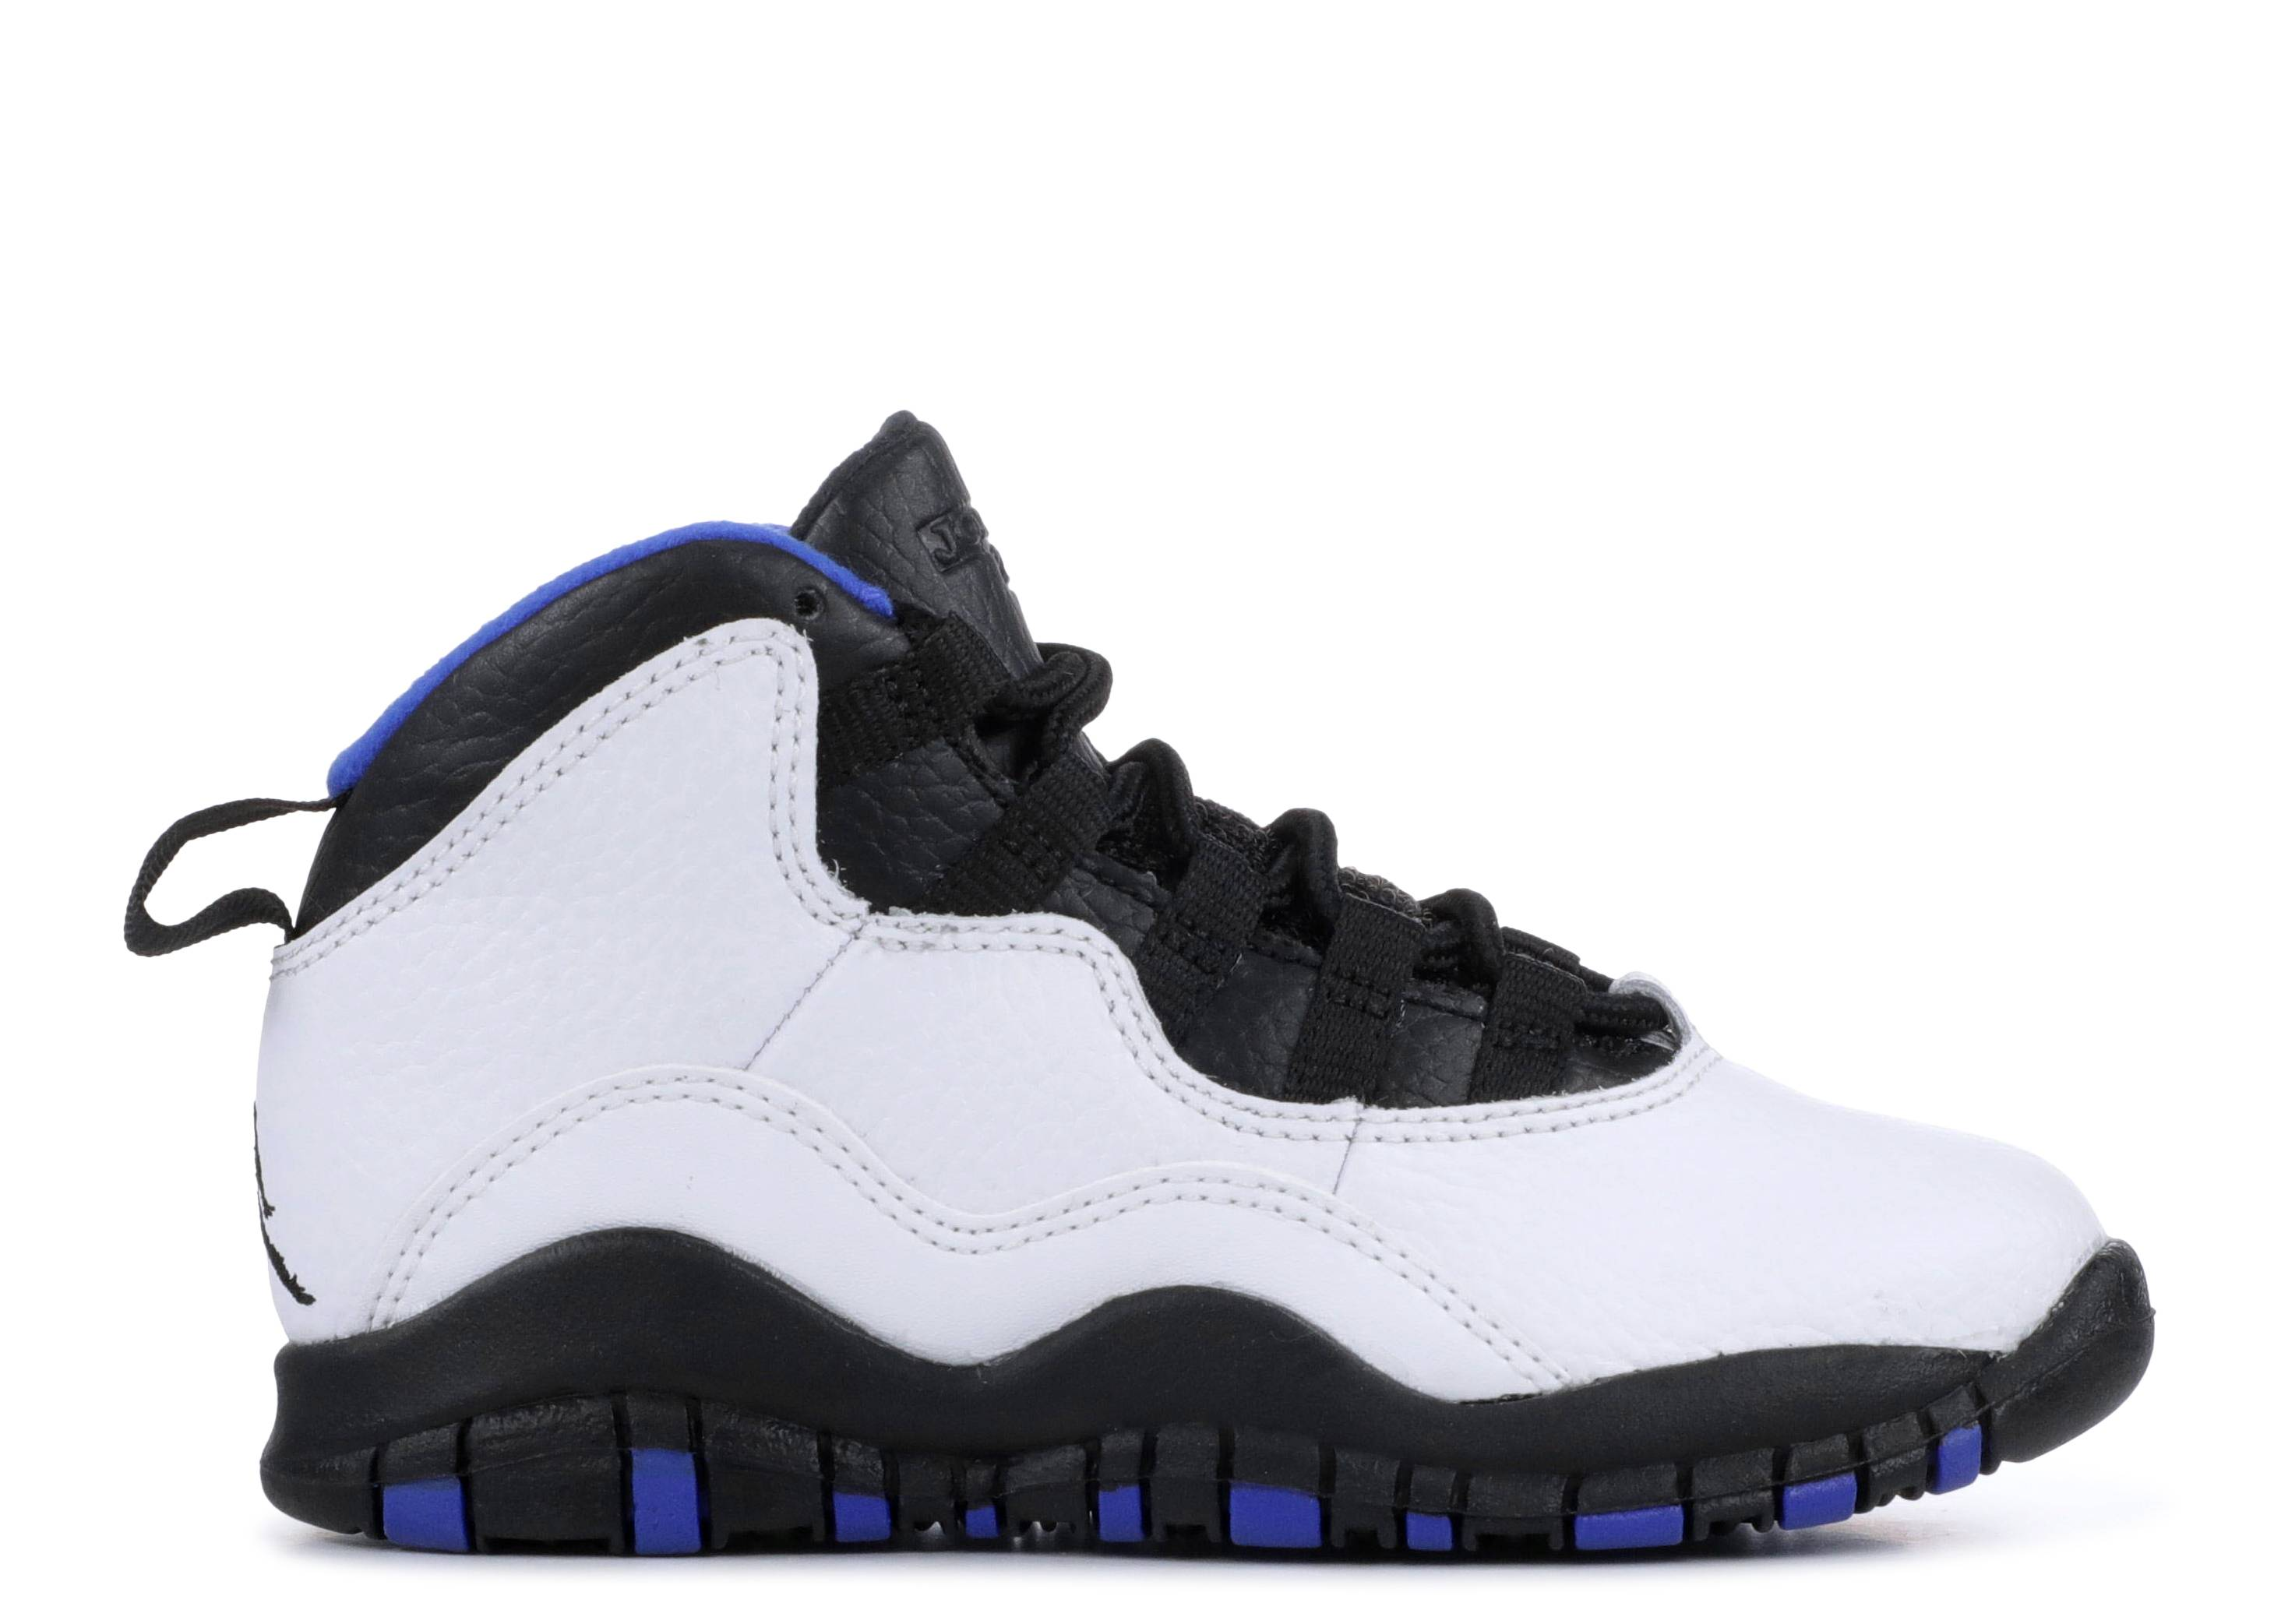 pretty nice 4a40a 63a64 Air Jordan 10 (X) Shoes - Nike | Flight Club